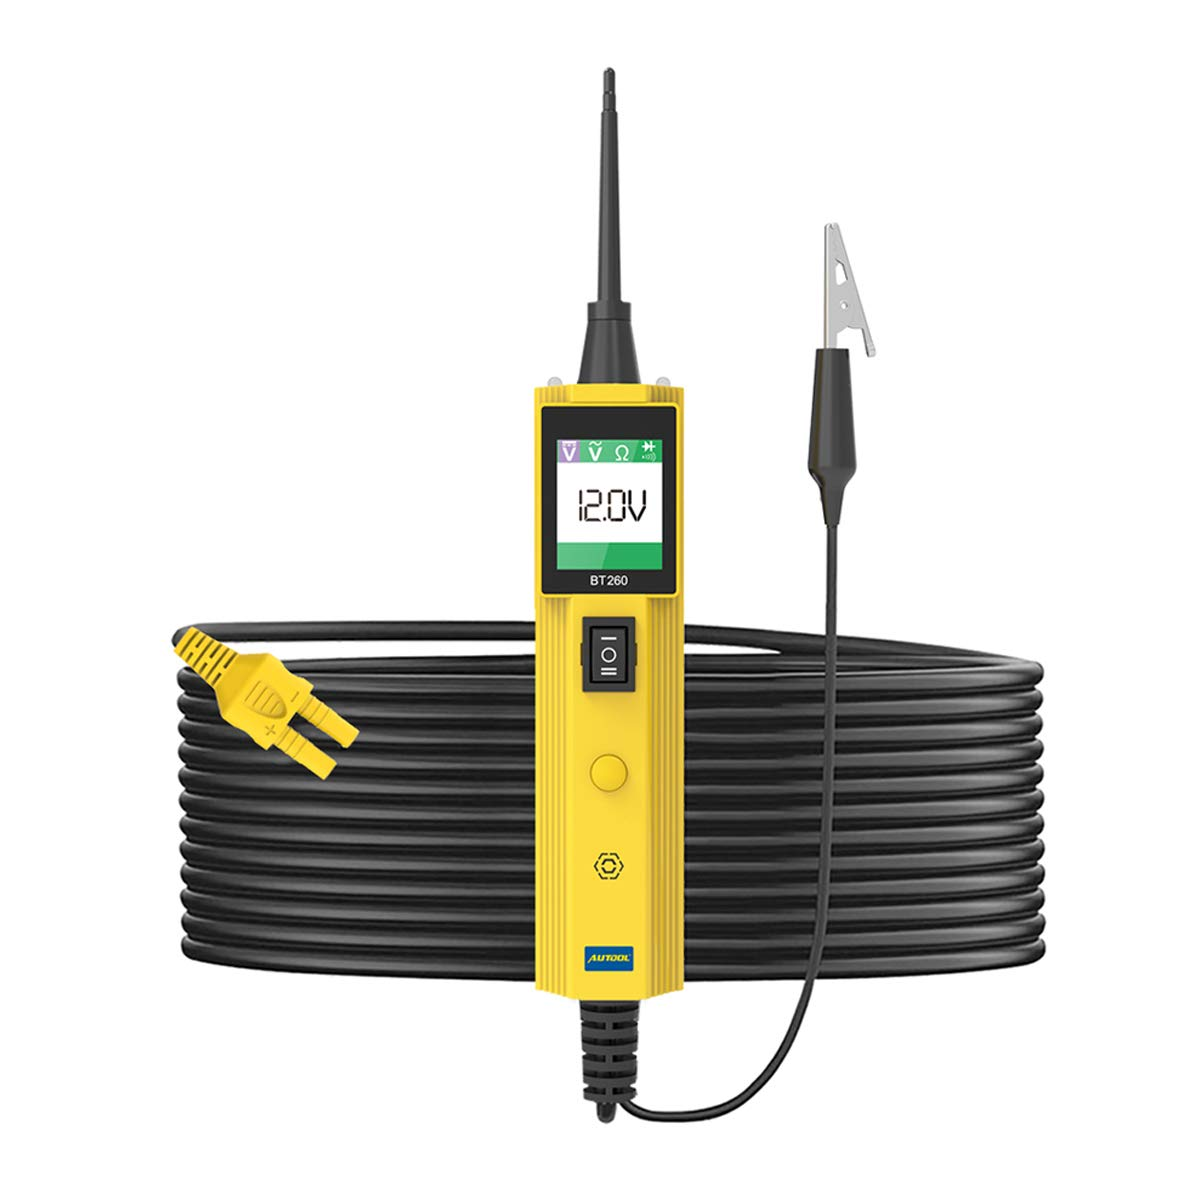 Automative Kit de sonda de corriente, Autool 6 - 30 V sistema eléctrico herramienta de diagnóstico comprobador de circuitos con LED Linterna para 6 V/12 V/24 V coche/barco/sistema